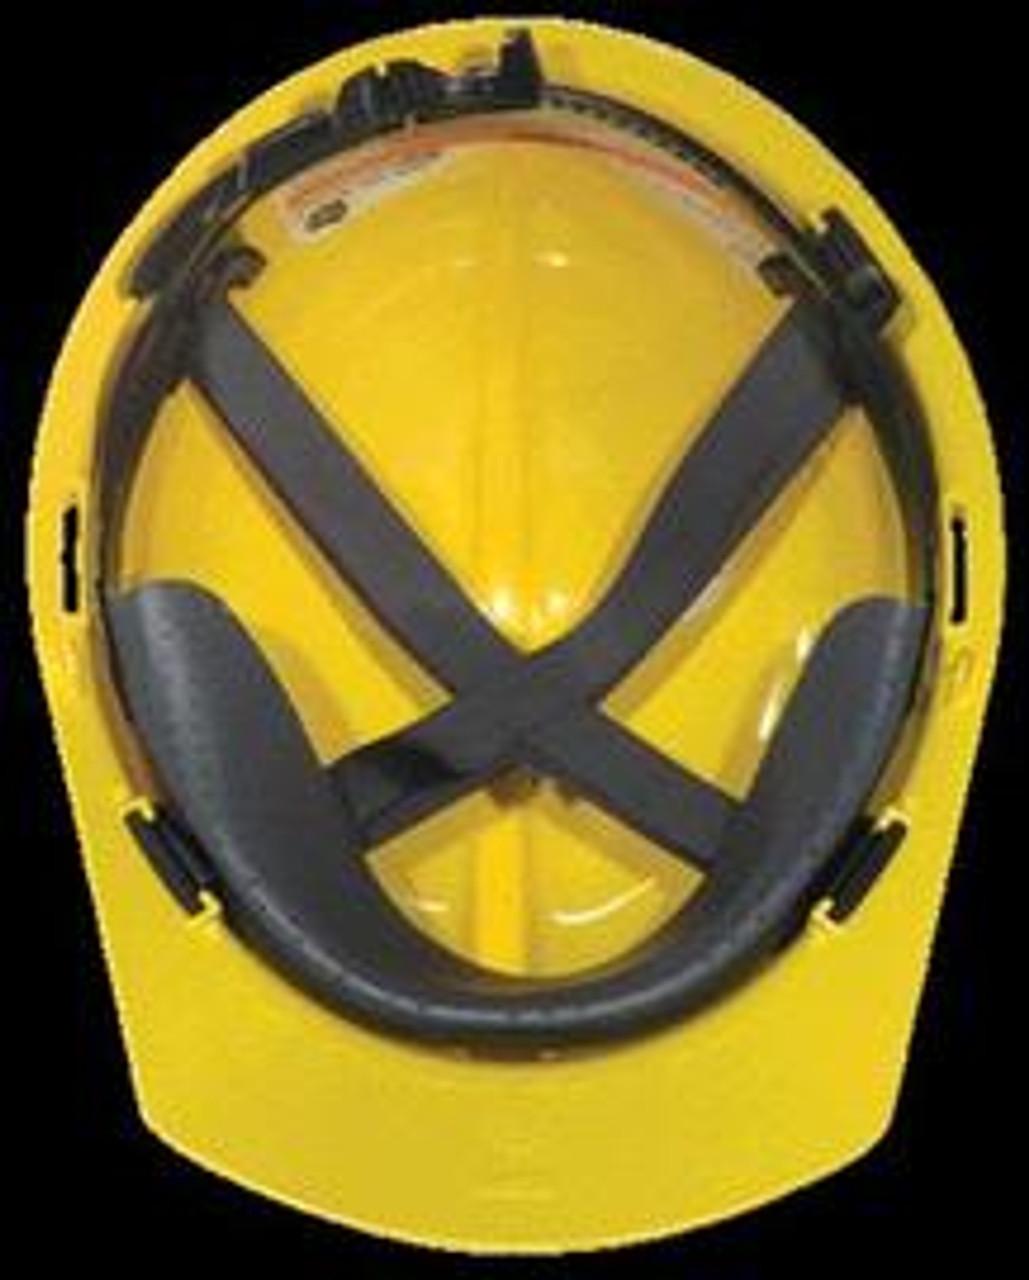 Radnor 64051019 Hardhat Suspensions, Parts & Accessories